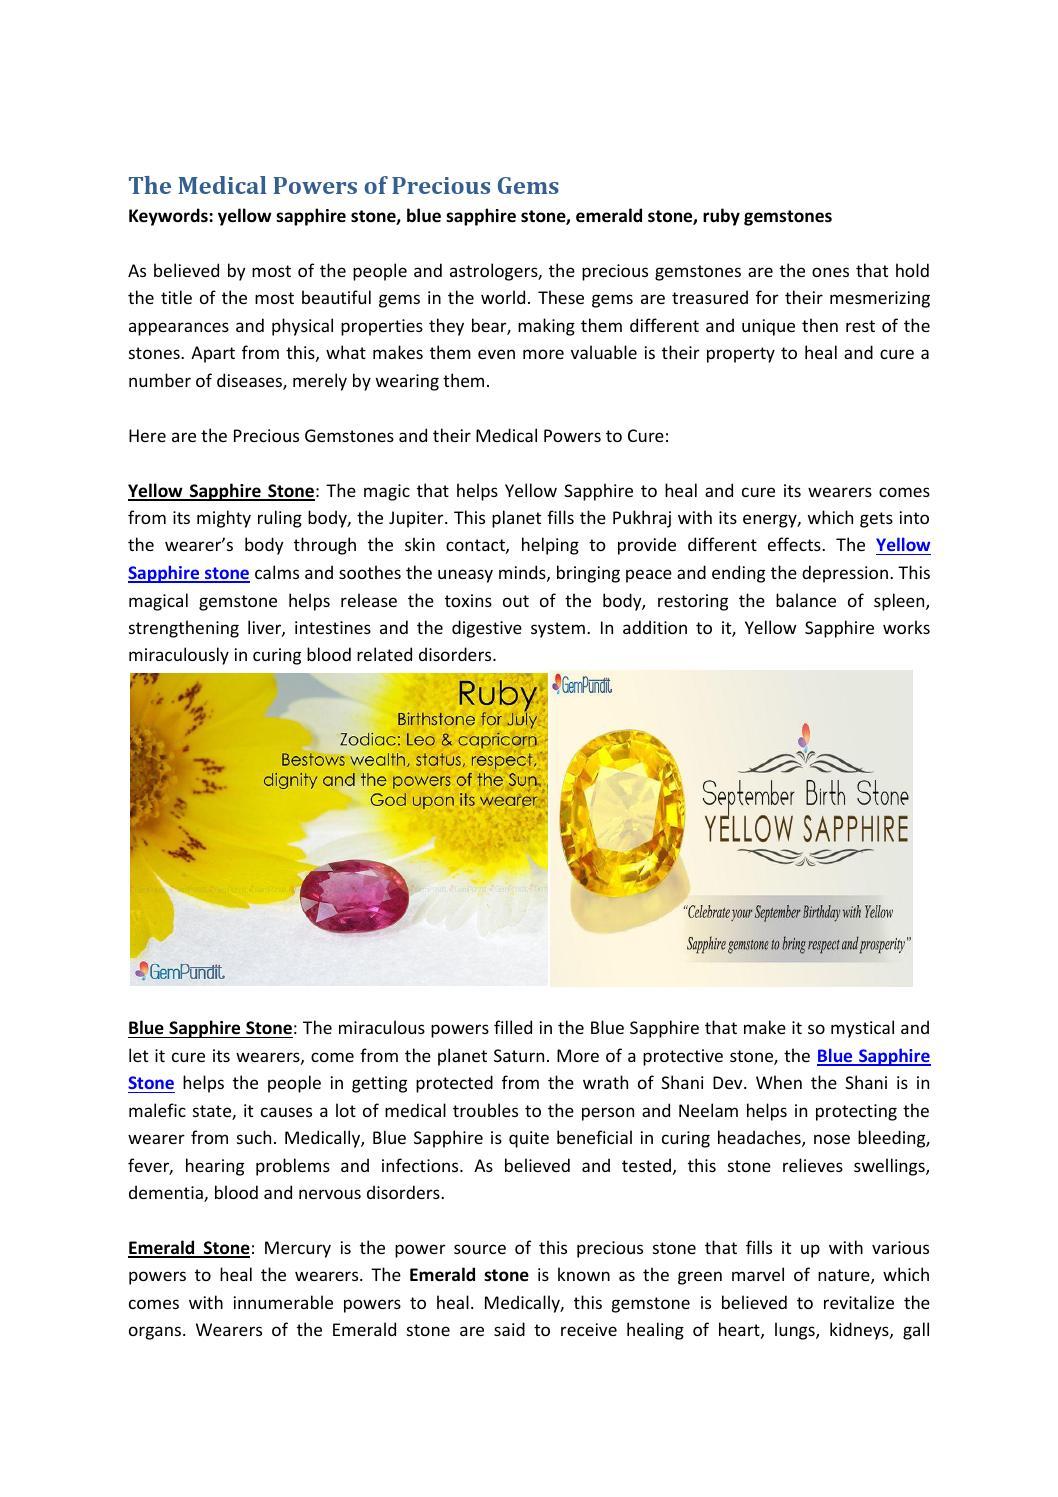 The medical powers of precious gems by Avnish Gempundit - issuu